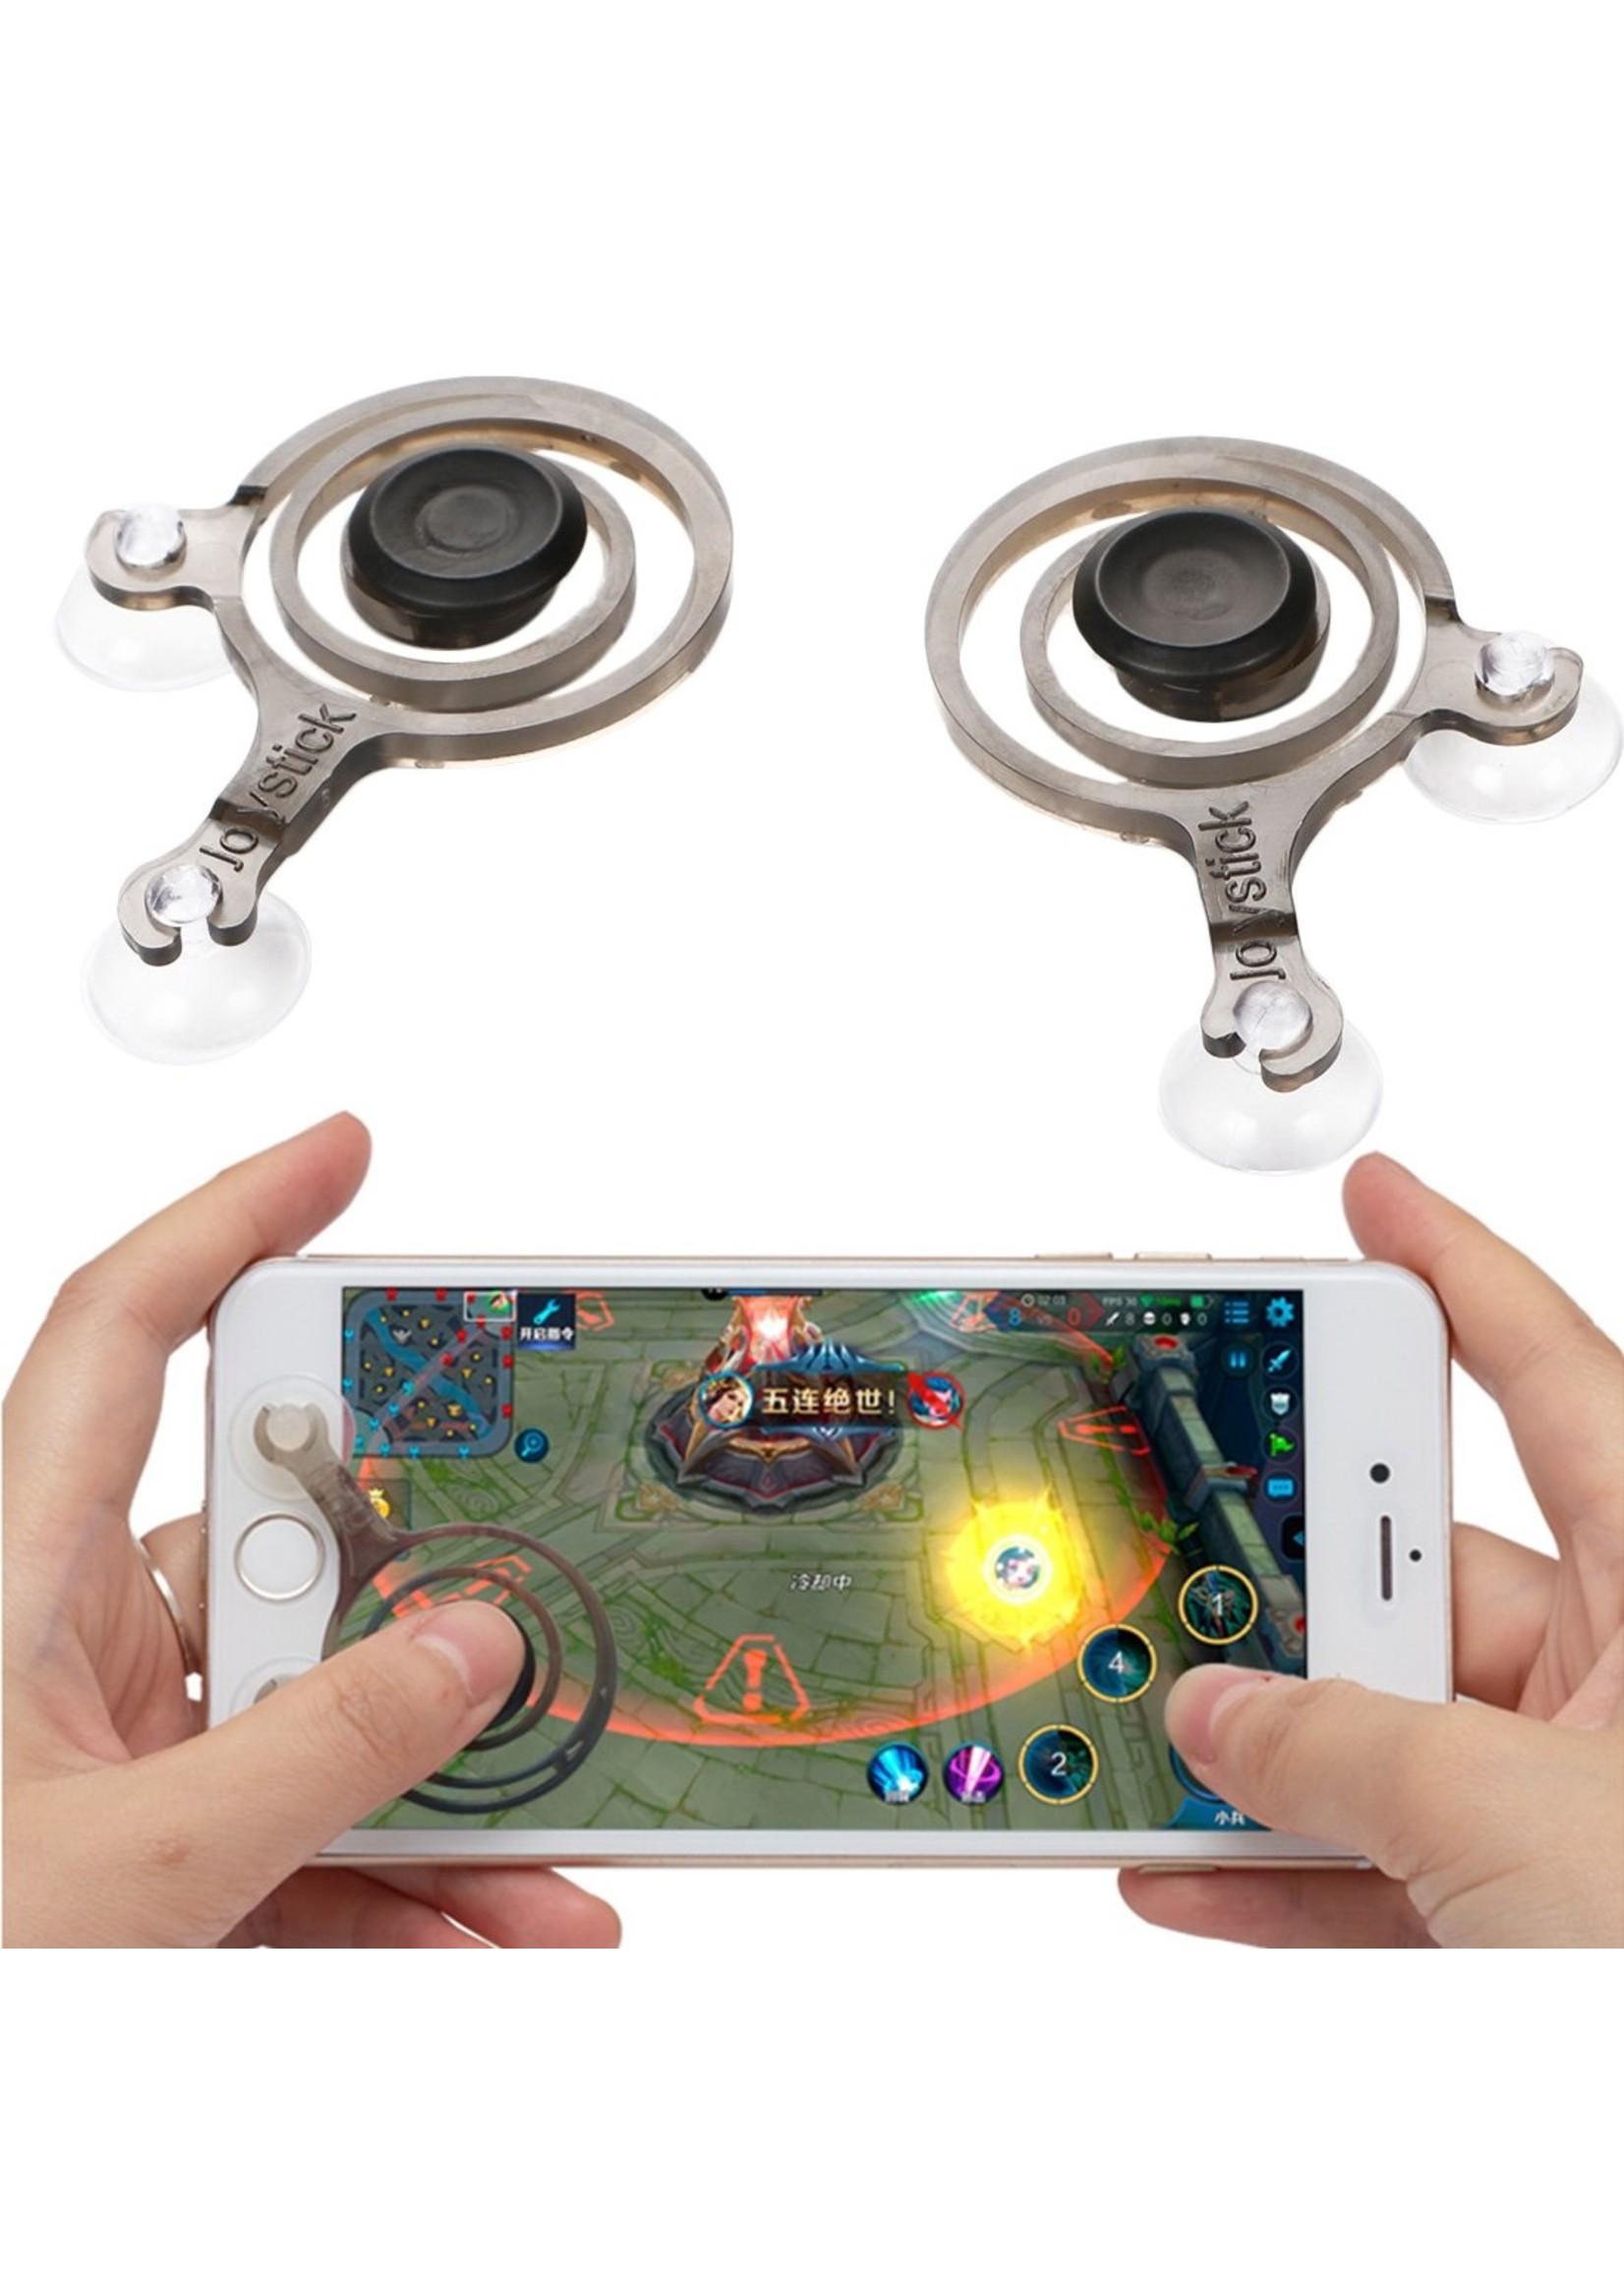 Kilofly 2pc Phone Gaming Analog Joystick